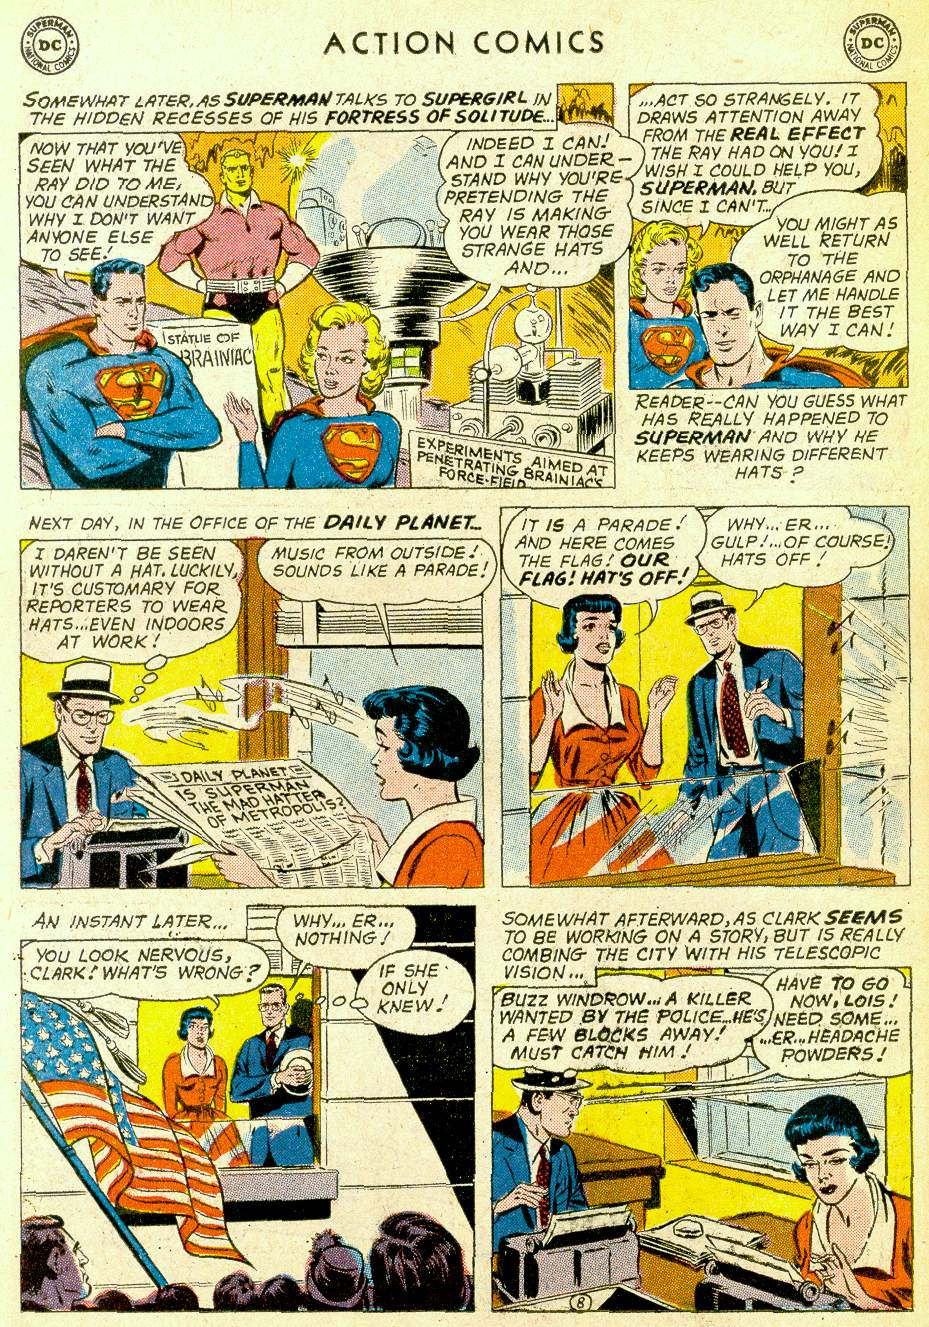 Action Comics (1938) 275 Page 9